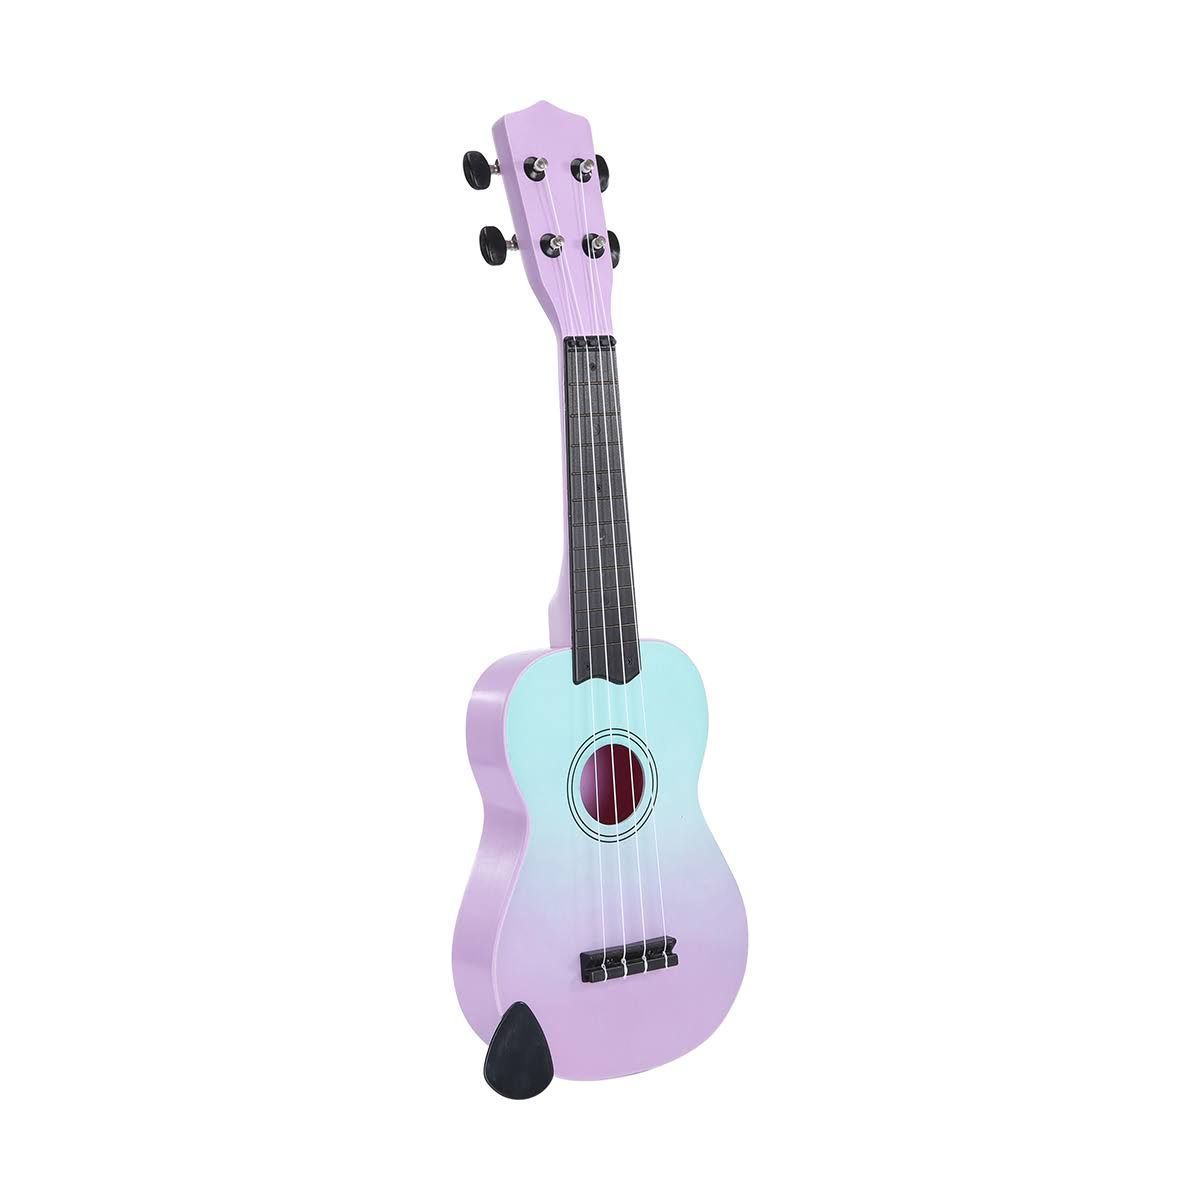 Guitar Tuner Kmart : kmart ukulele coral instument ukulele character fictional characters ~ Hamham.info Haus und Dekorationen